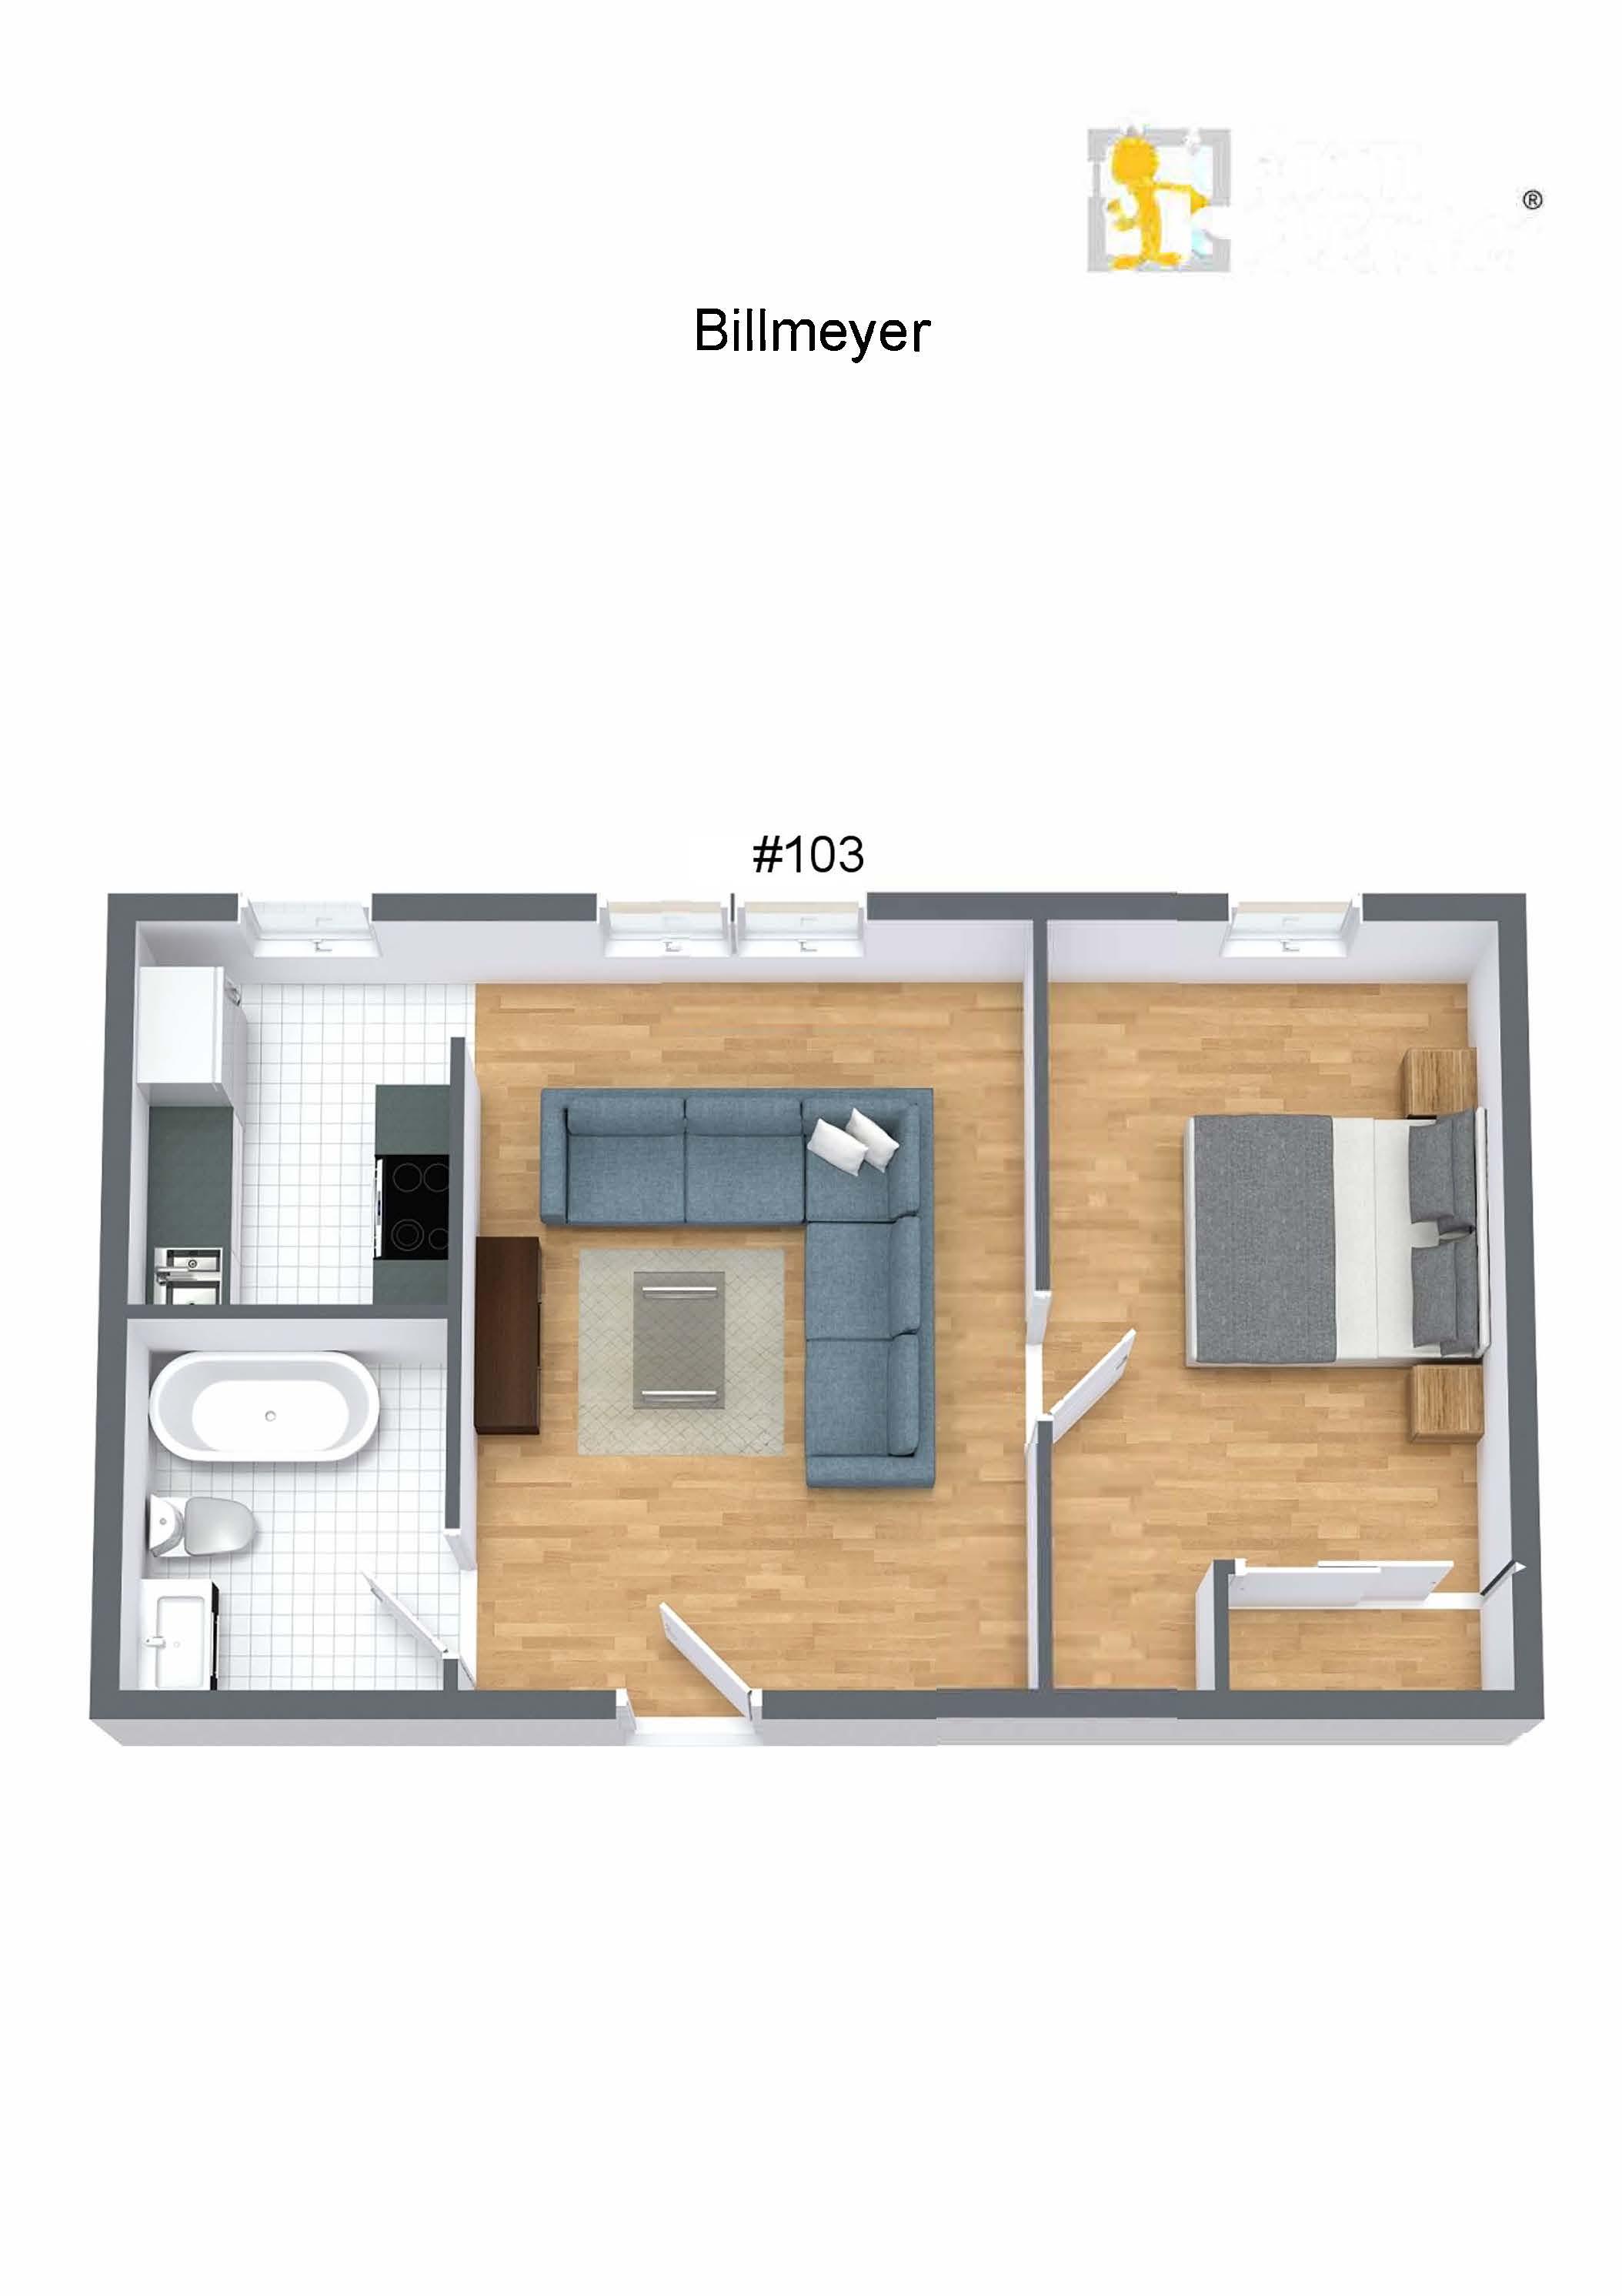 Billmeyer NEW - #103 - 3D Floor Plan.jpg